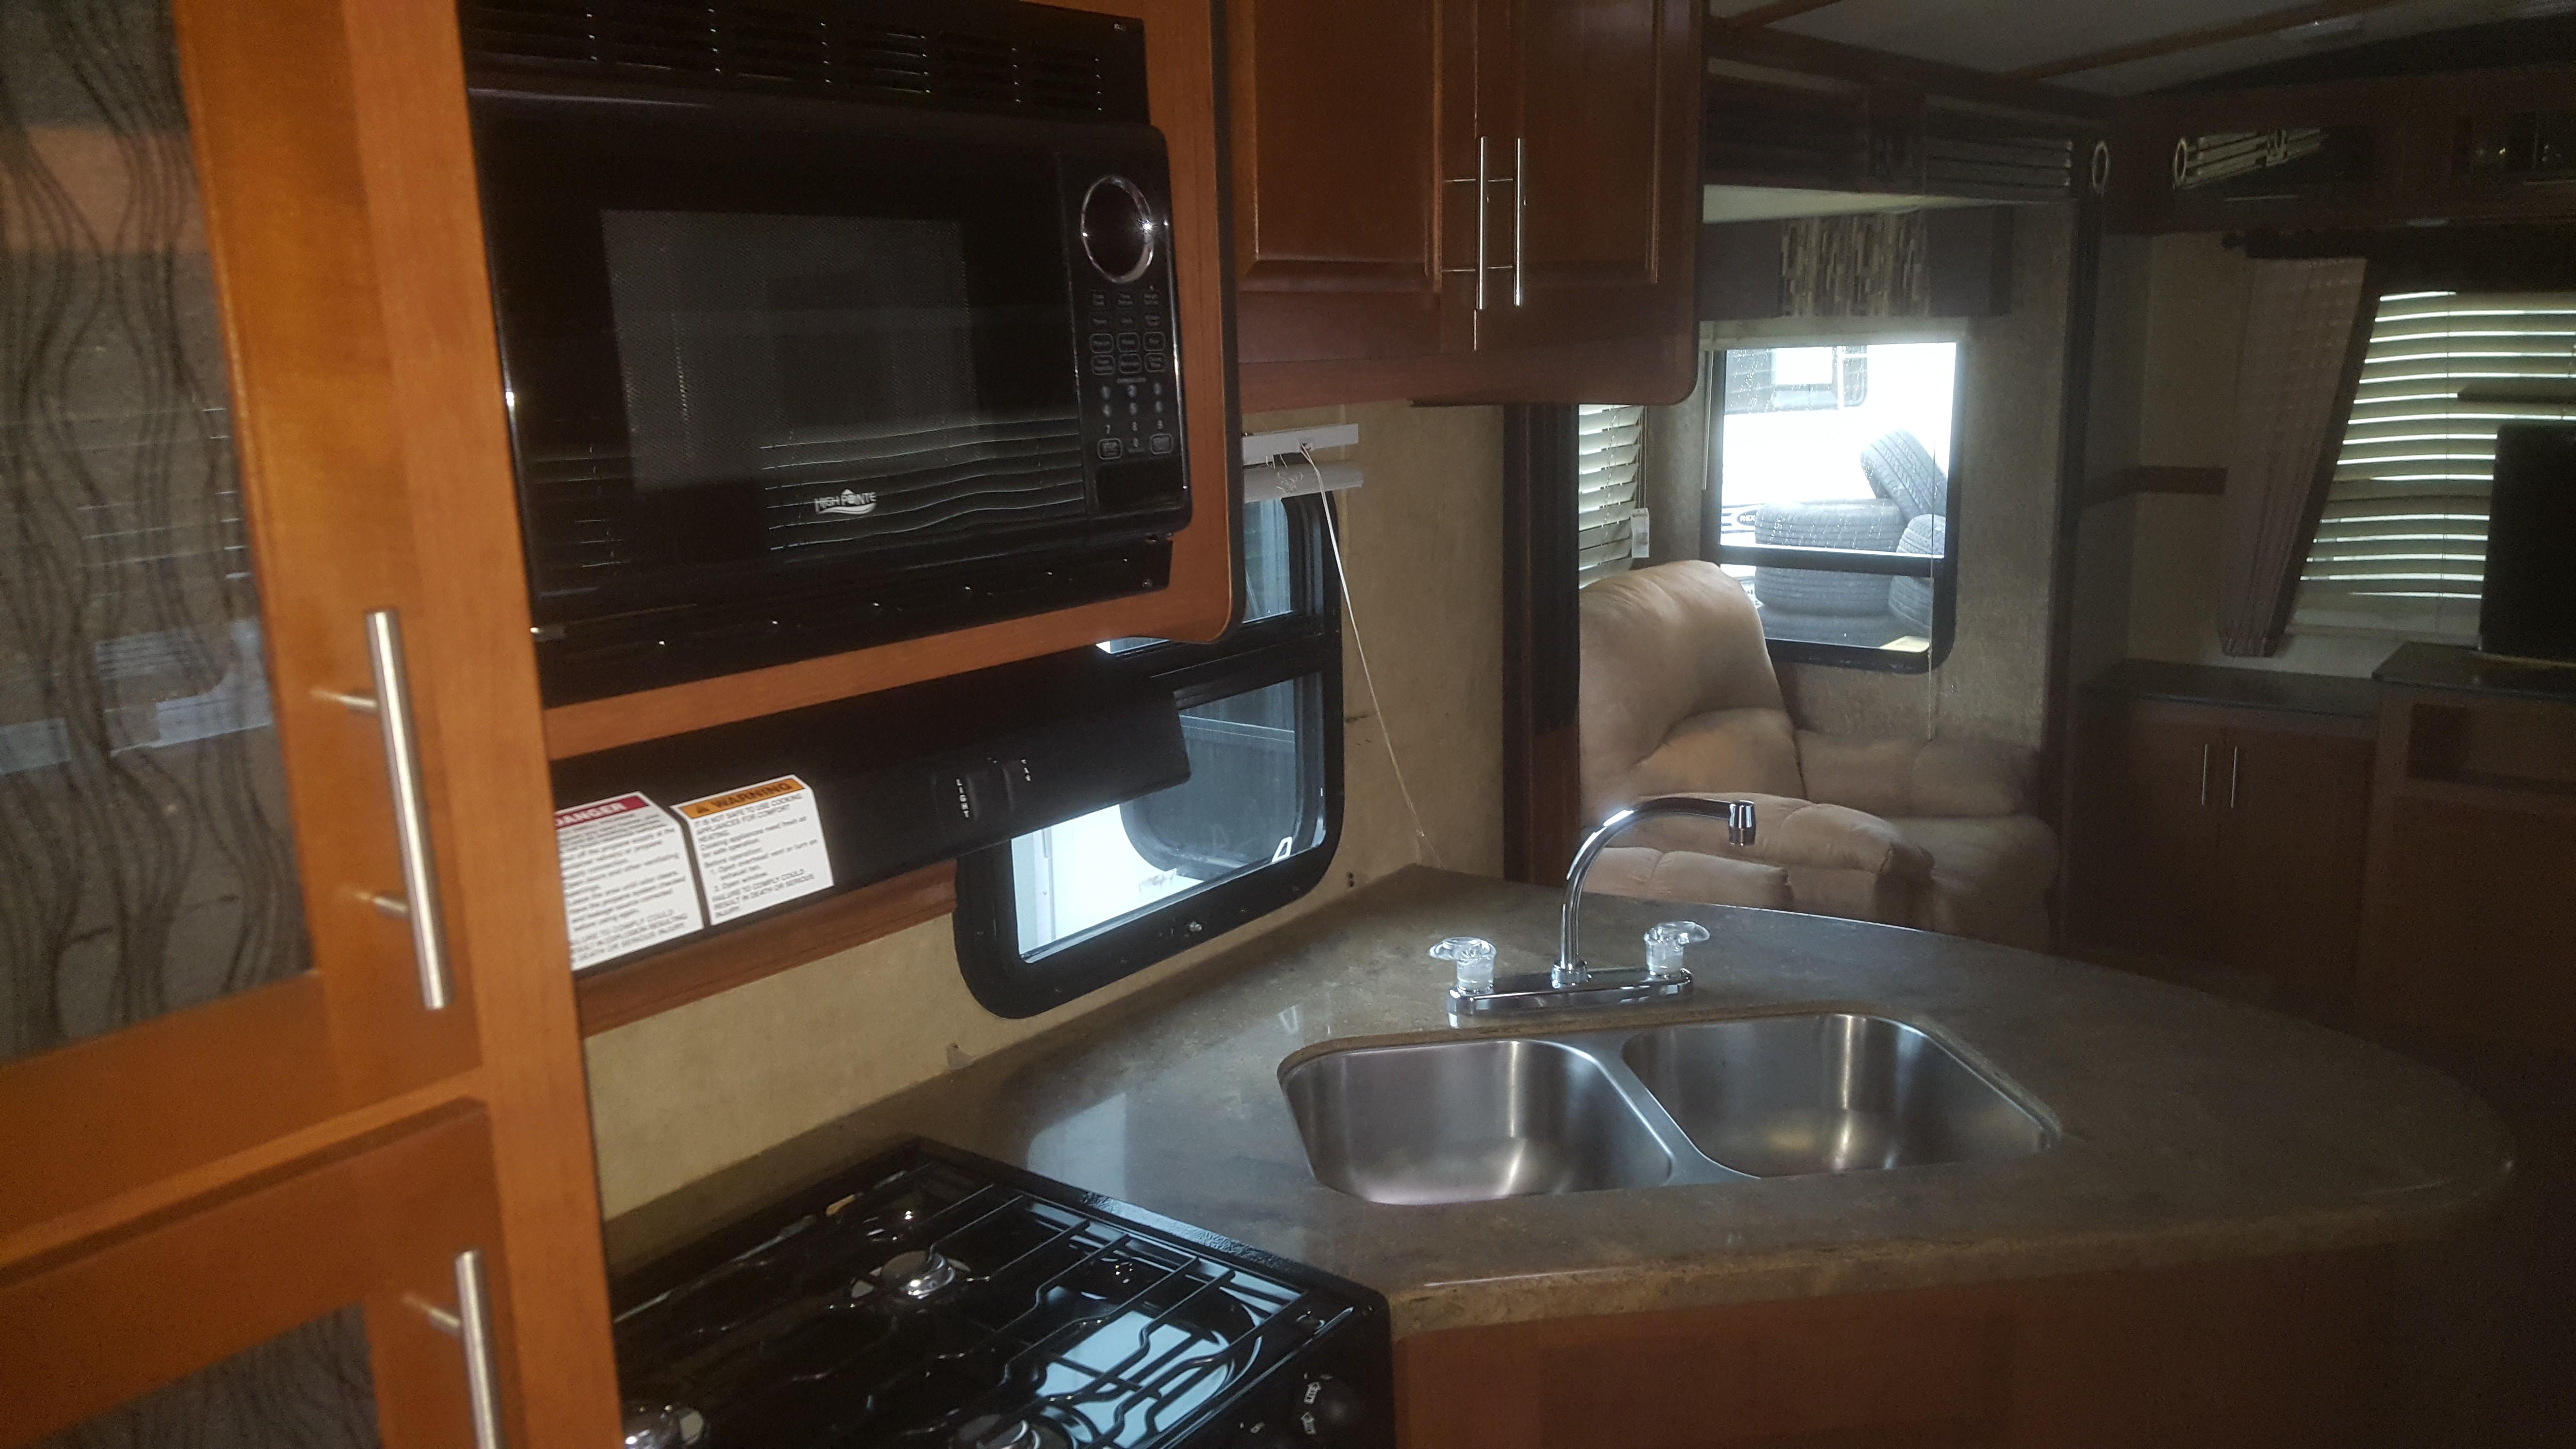 Used 2012 Dutchmen Komfort 2955re In Sacramento Ca